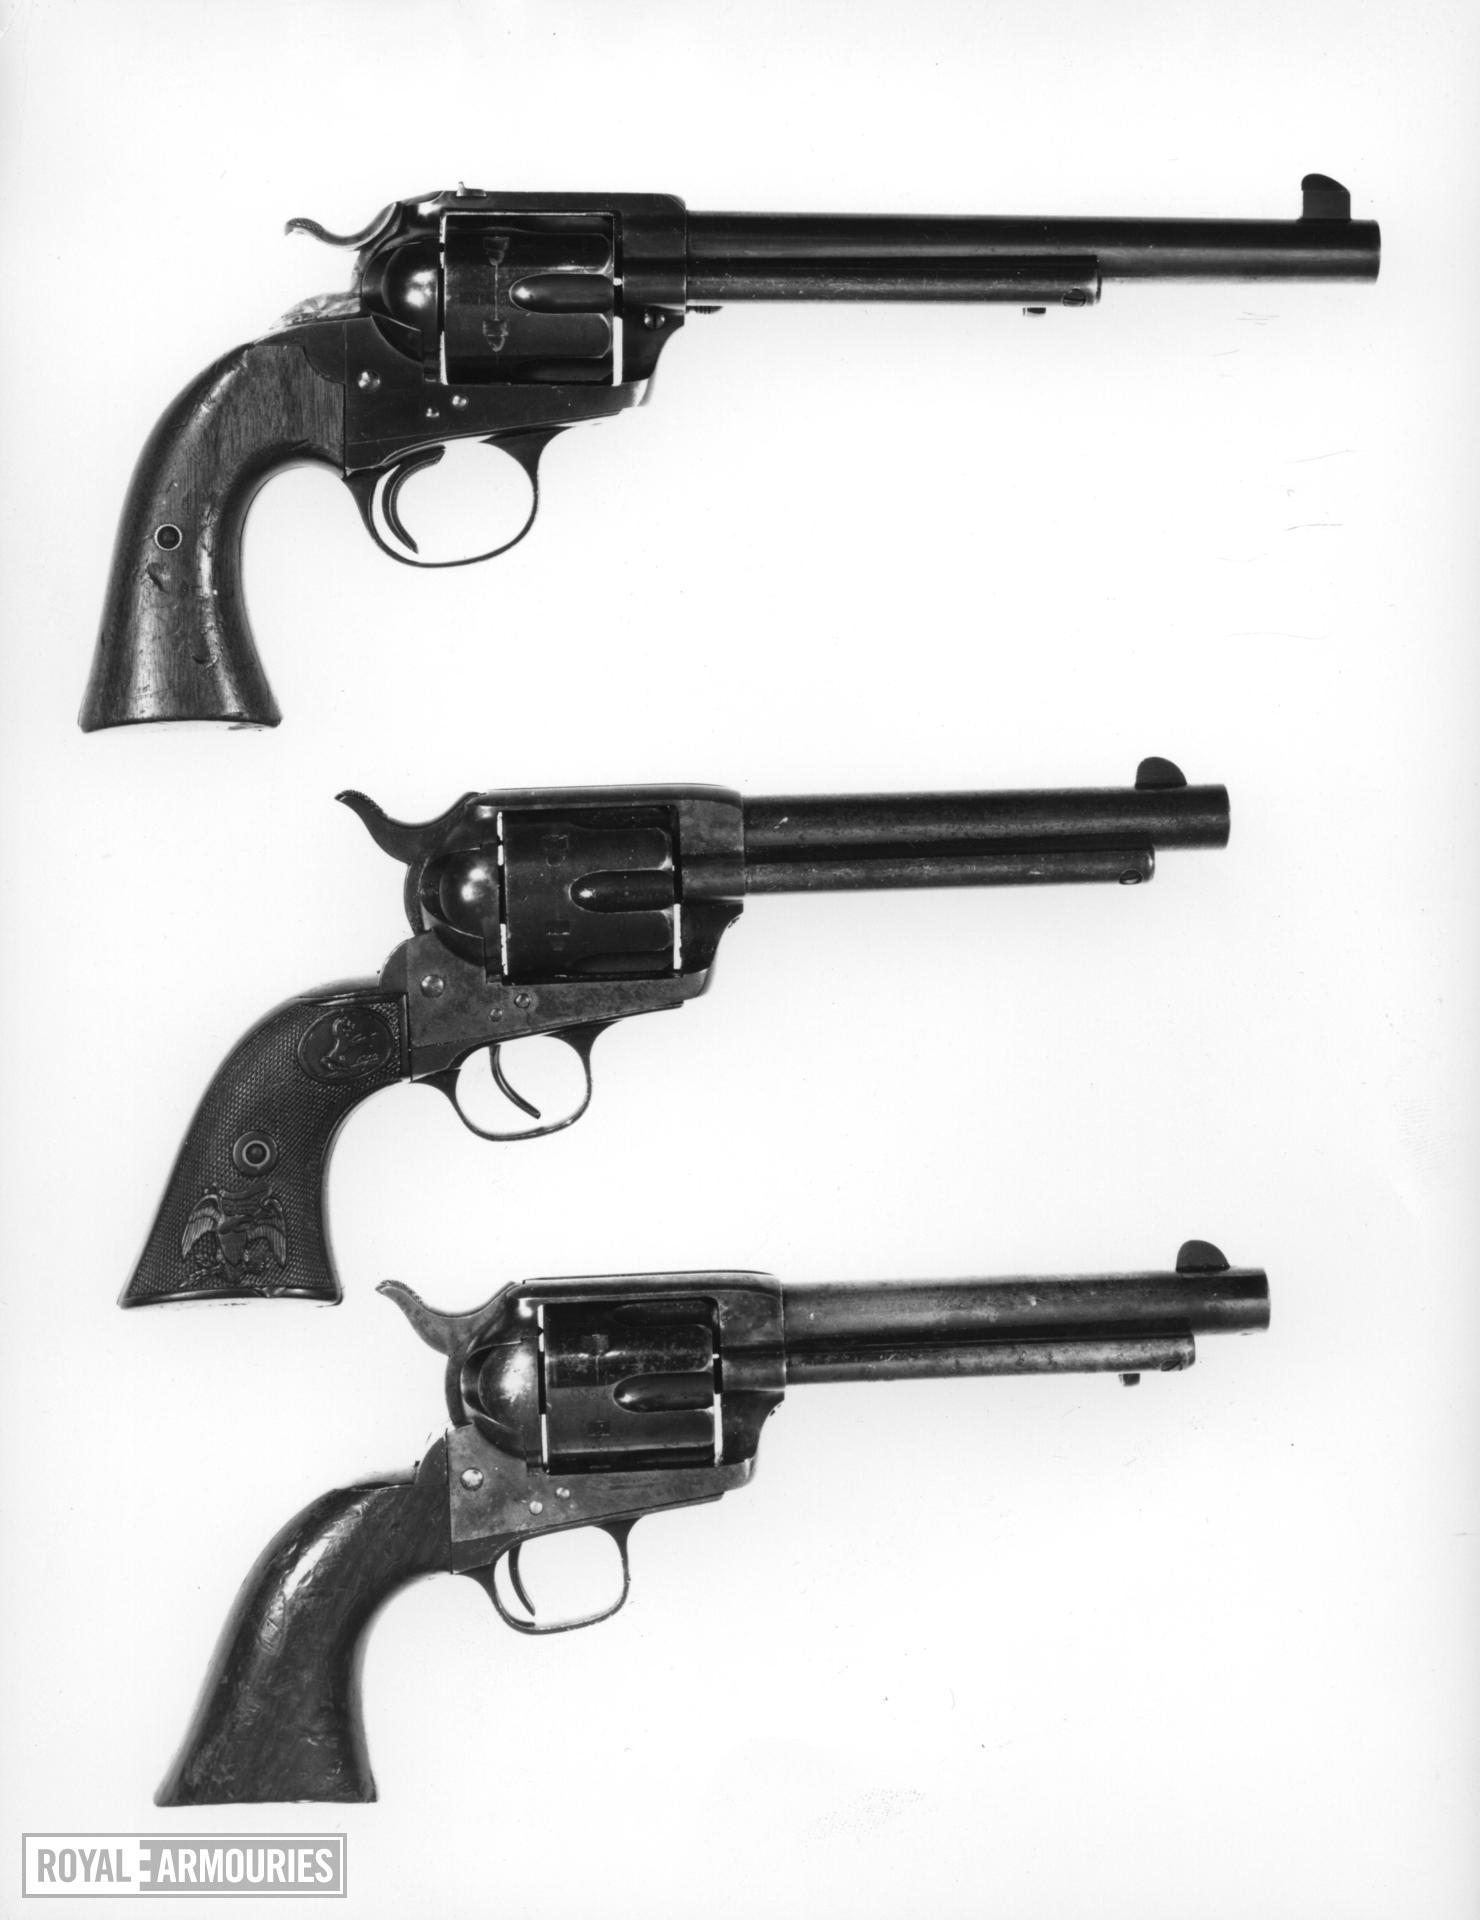 Centrefire six-shot revolver - Colt Single Action Army Model (SAA)